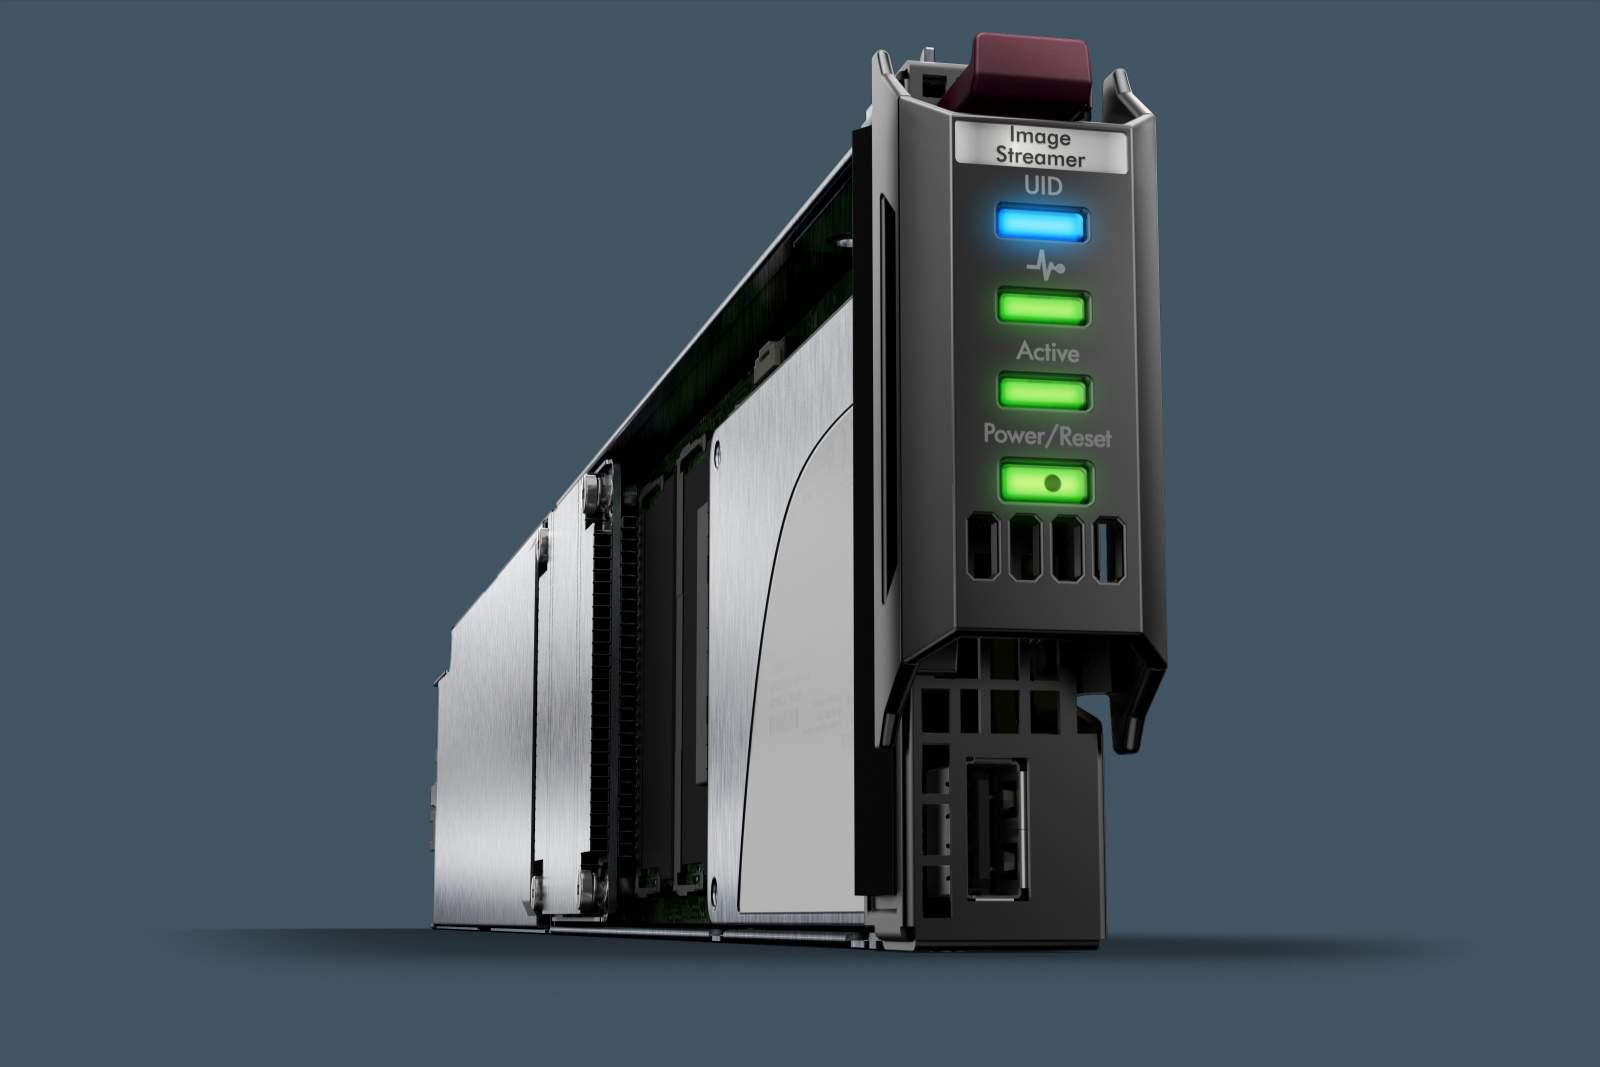 HPE Synergy Image Streamer